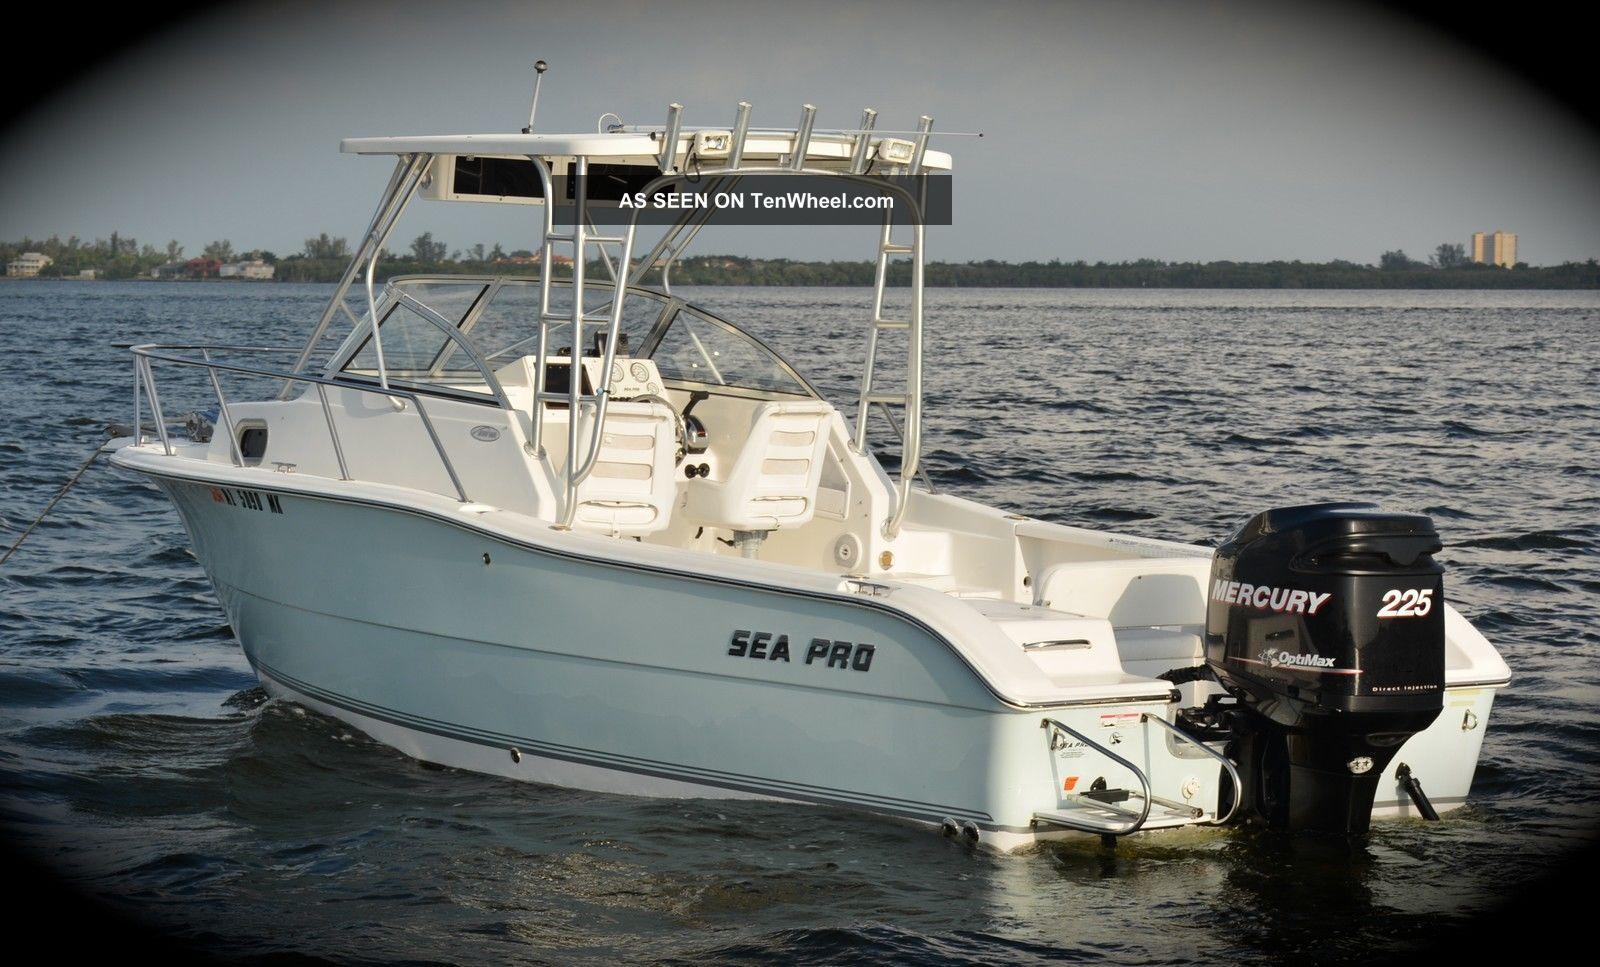 2007 Sea Pro 238 Wa Offshore Saltwater Fishing photo